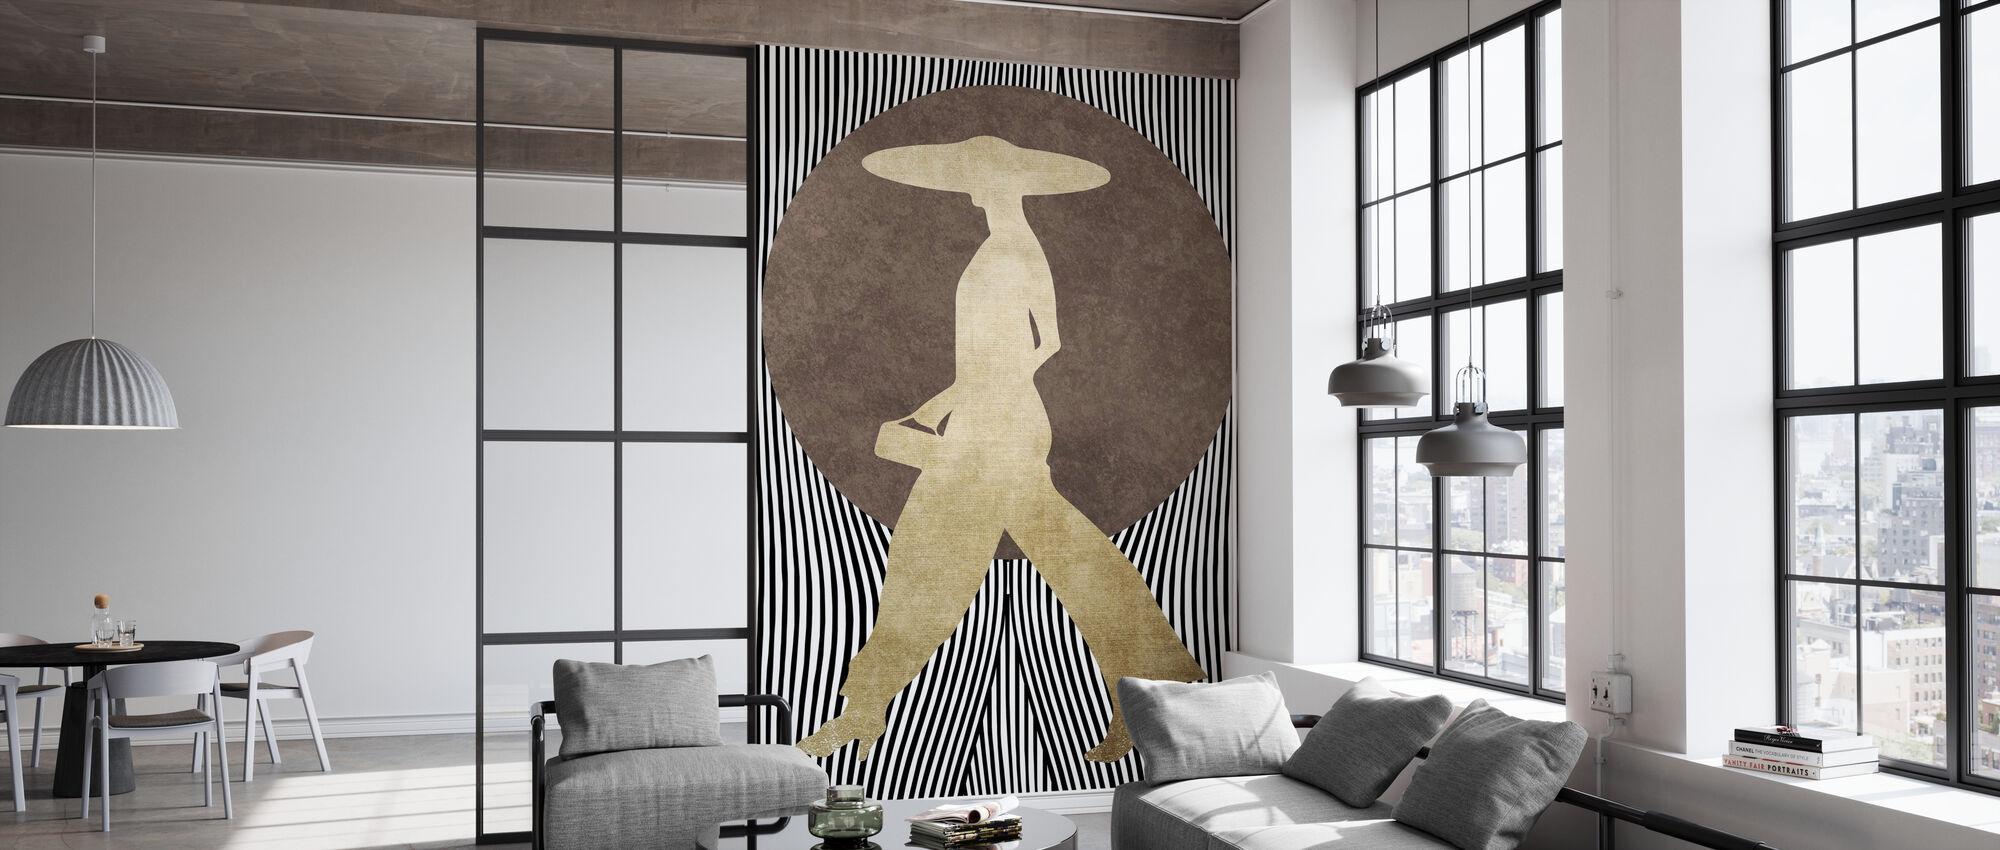 La Madame Noir - Wallpaper - Office